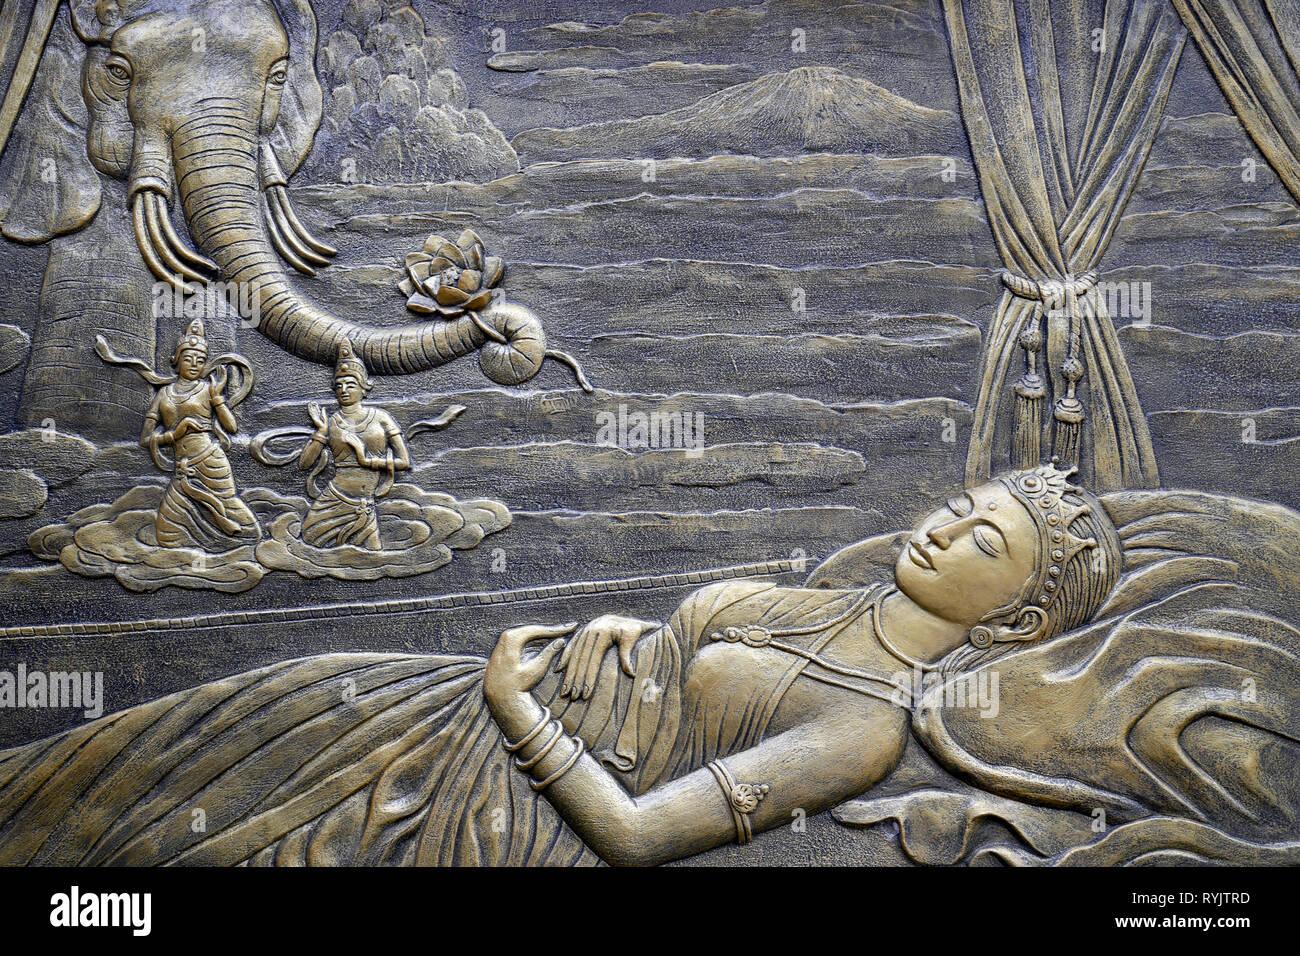 Tinh Xa Ngoc Chau Buddhist temple. The Life of the Buddha, Siddhartha Gautama. BuddhaÕs Mother Maya dreams about the White Elephant entering her womb. - Stock Image